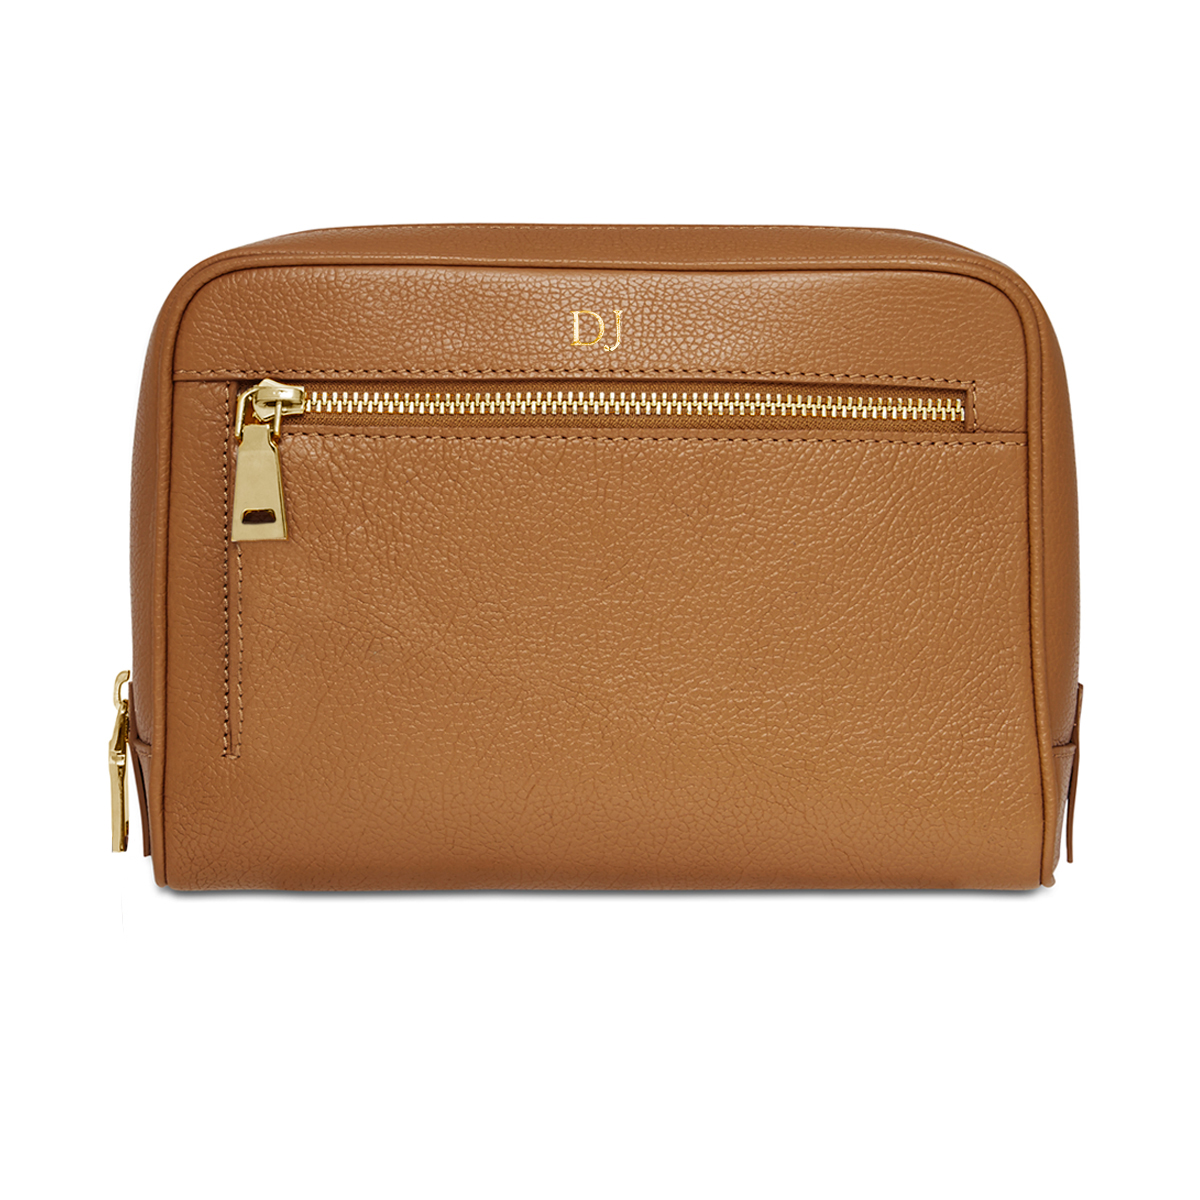 Grainy Tan Wash Bag (Gold Zip)